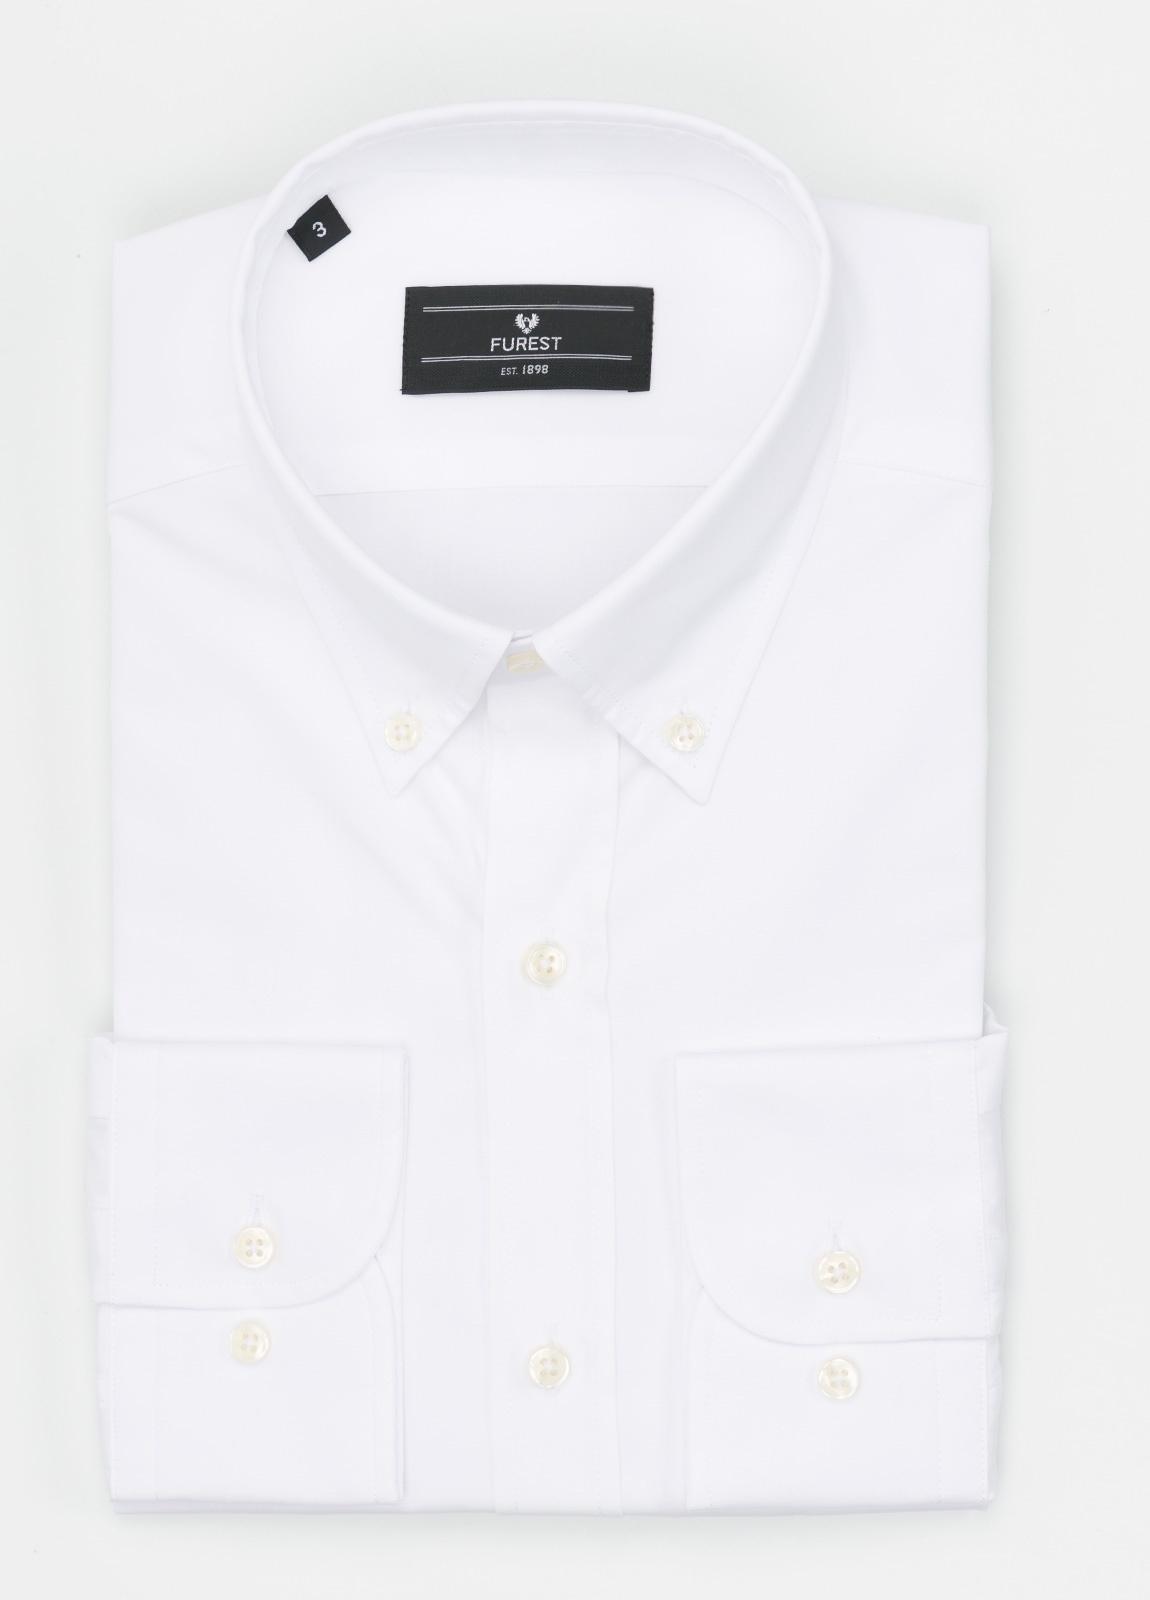 Camisa Formal Wear REGULAR FIT modelo BOTTON DOWN, con bolsillo, lisa, color blanca . 100% Algodón. Fácil planchado.